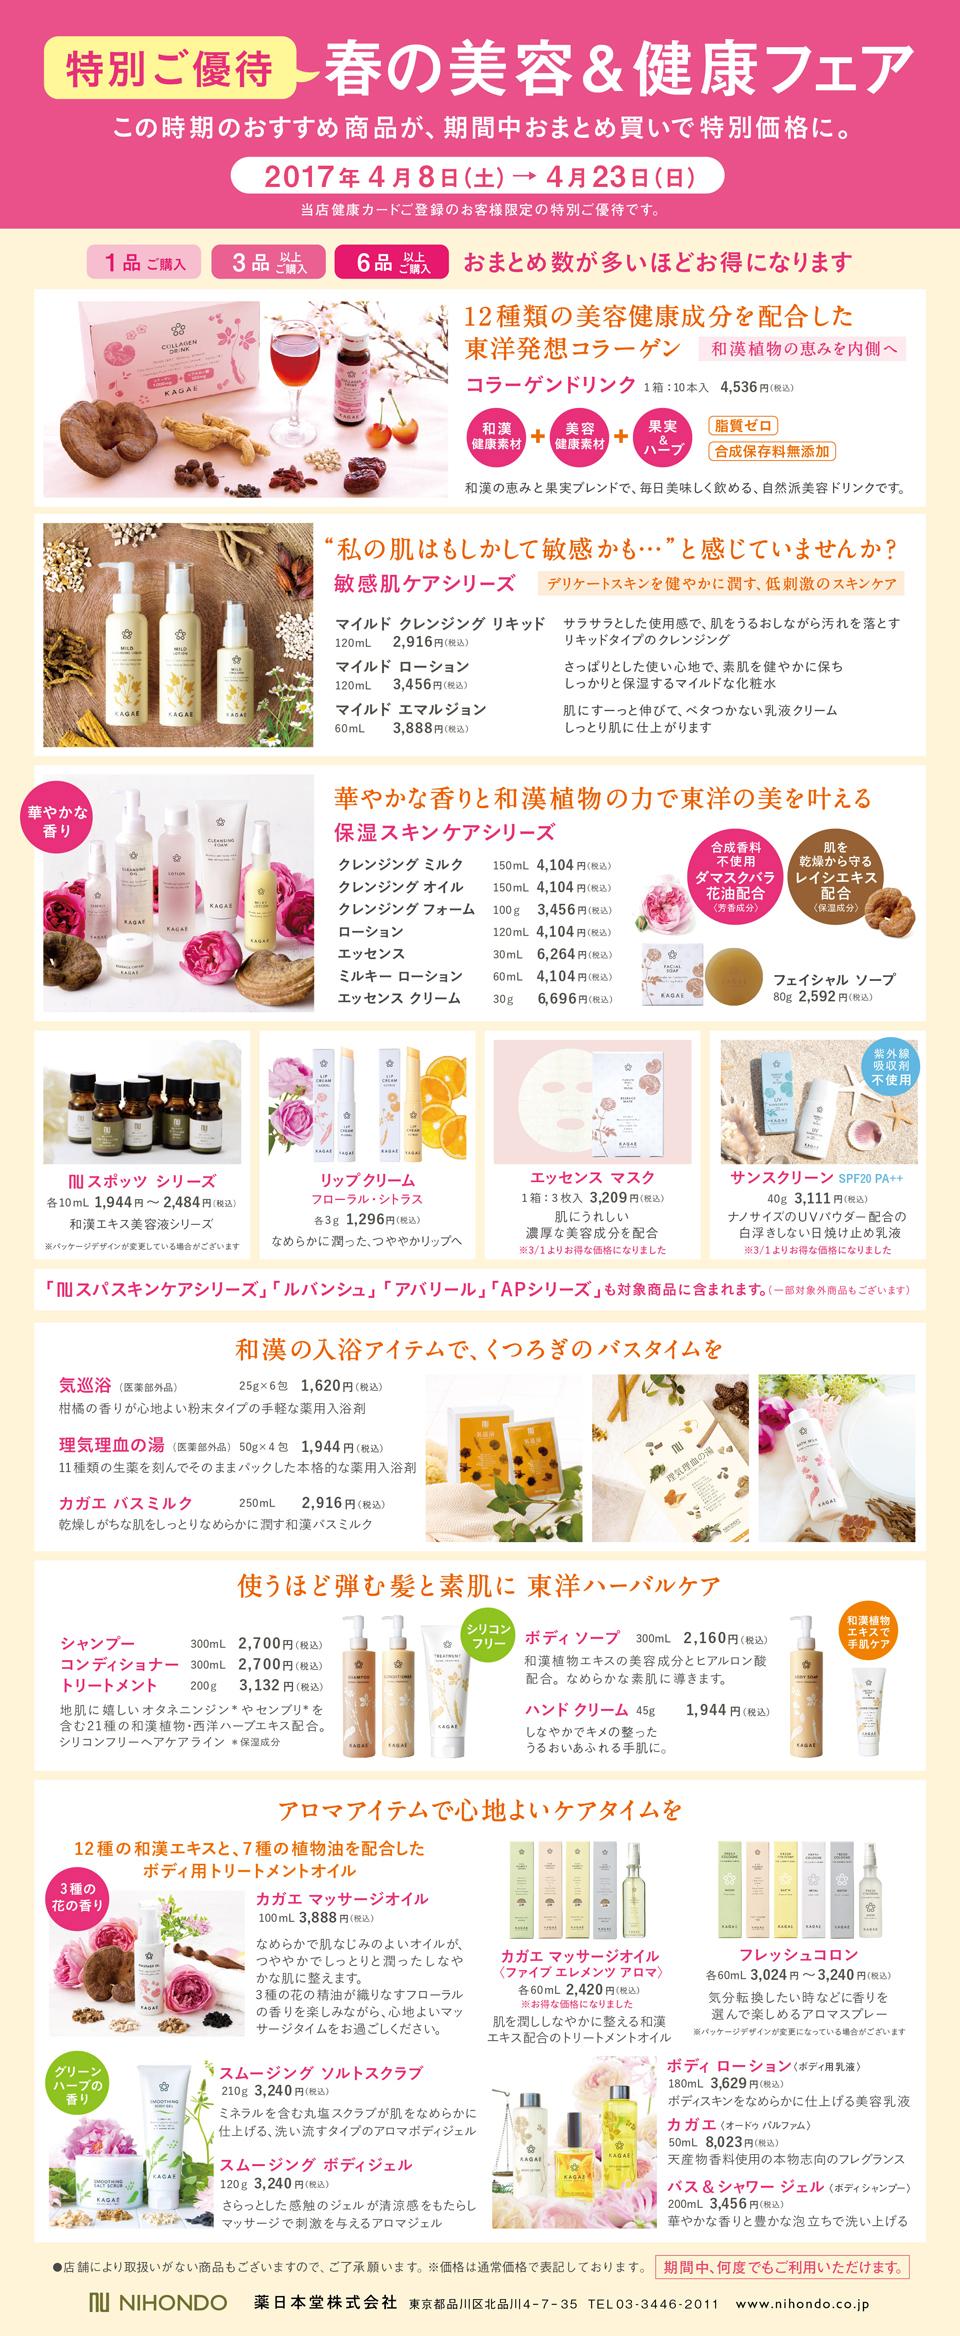 http://www.odori-bisse.com/info/up_images/nihondoh_170327_img.jpg